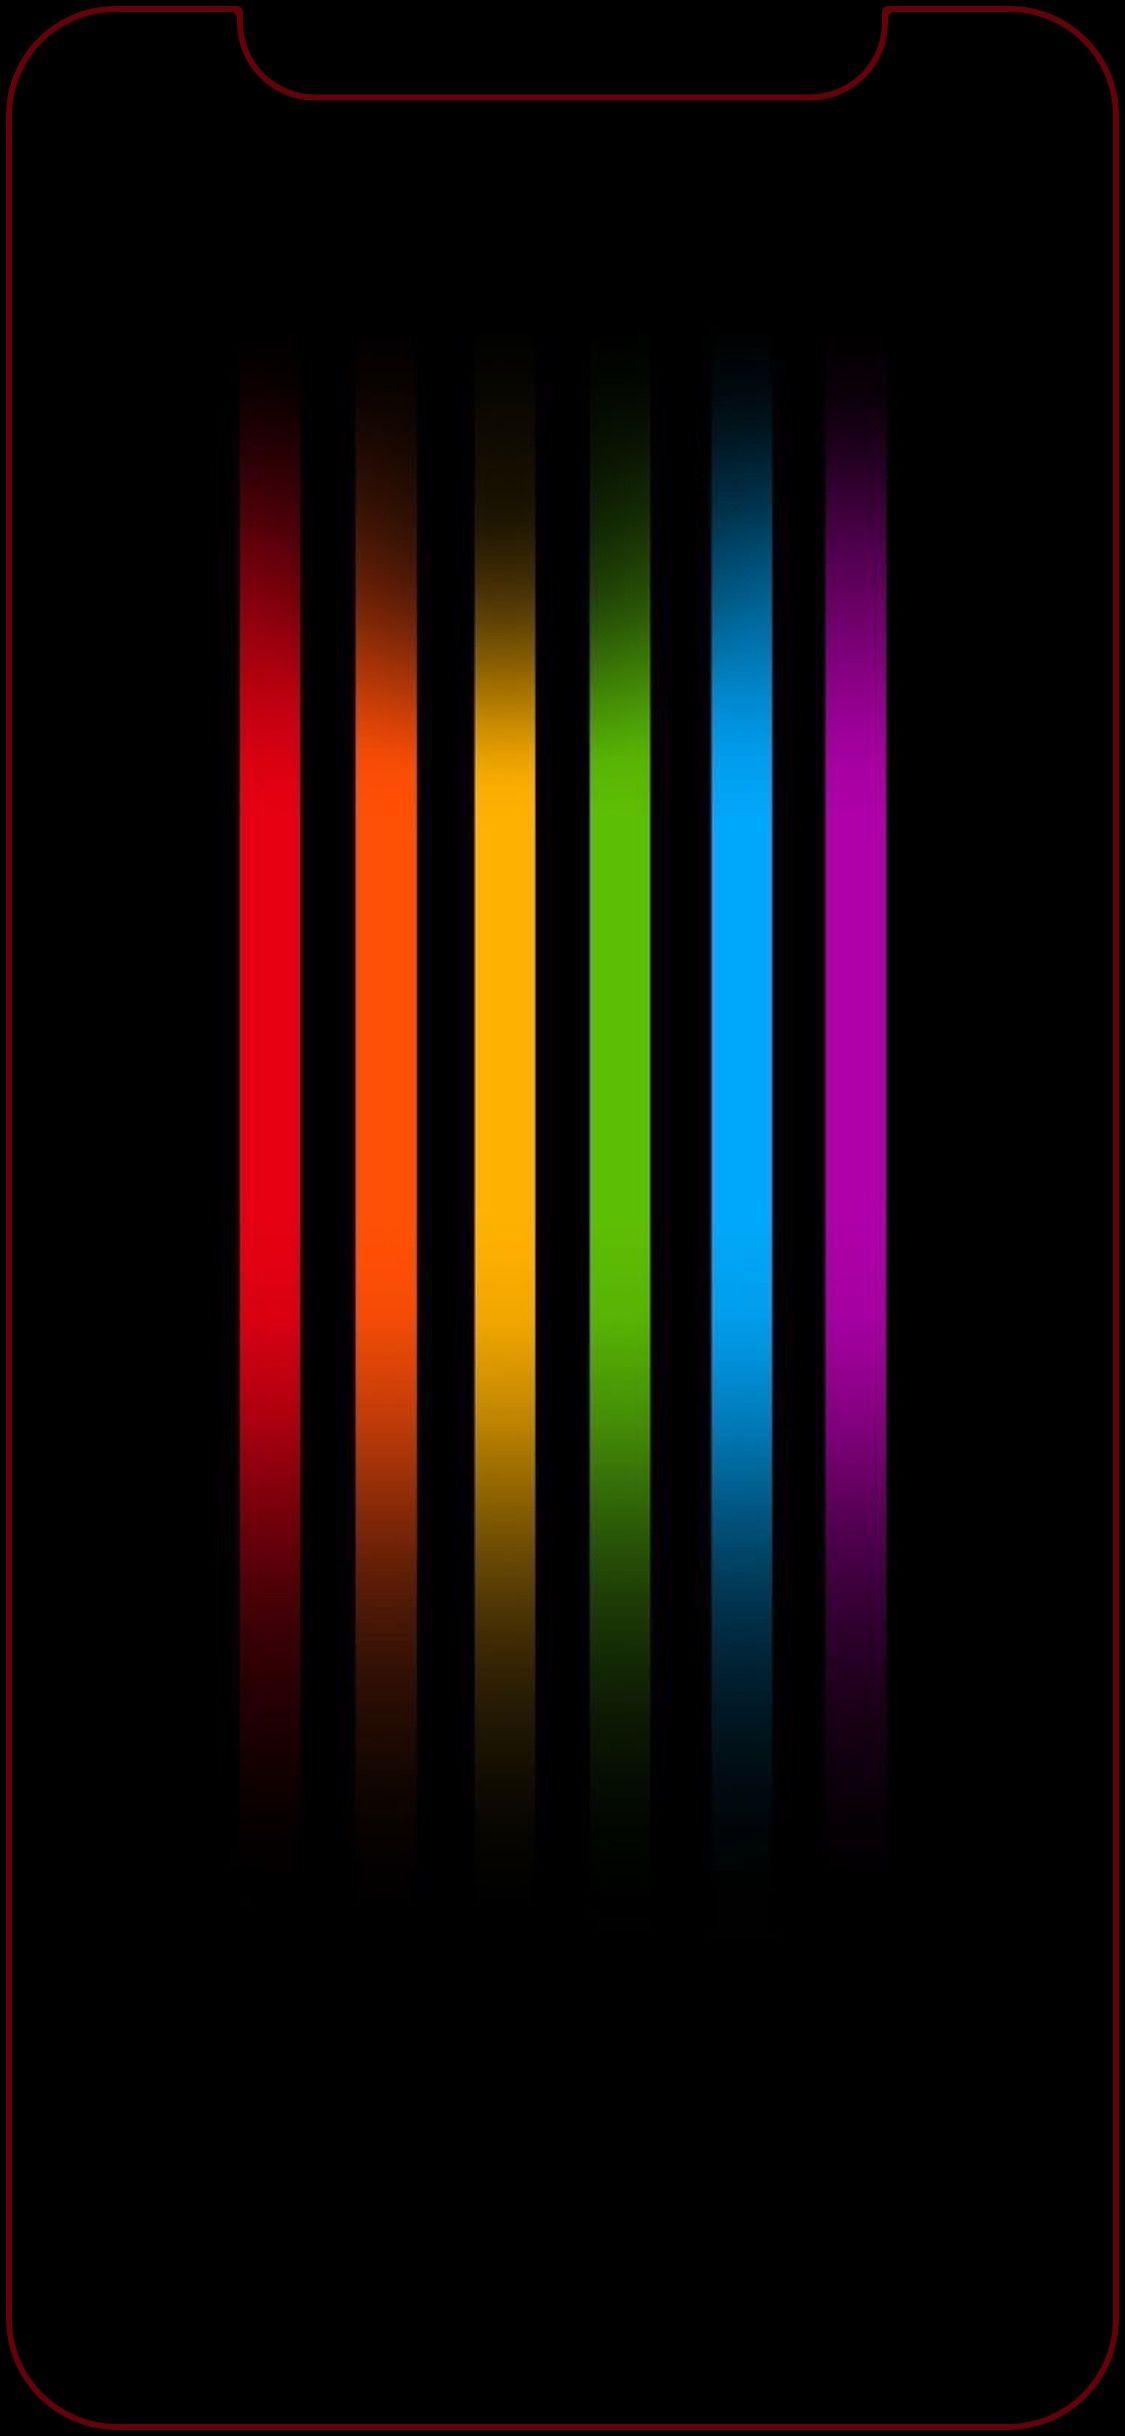 Pin by Deon Van Der Merwe on iphone x wallpaper Rainbow